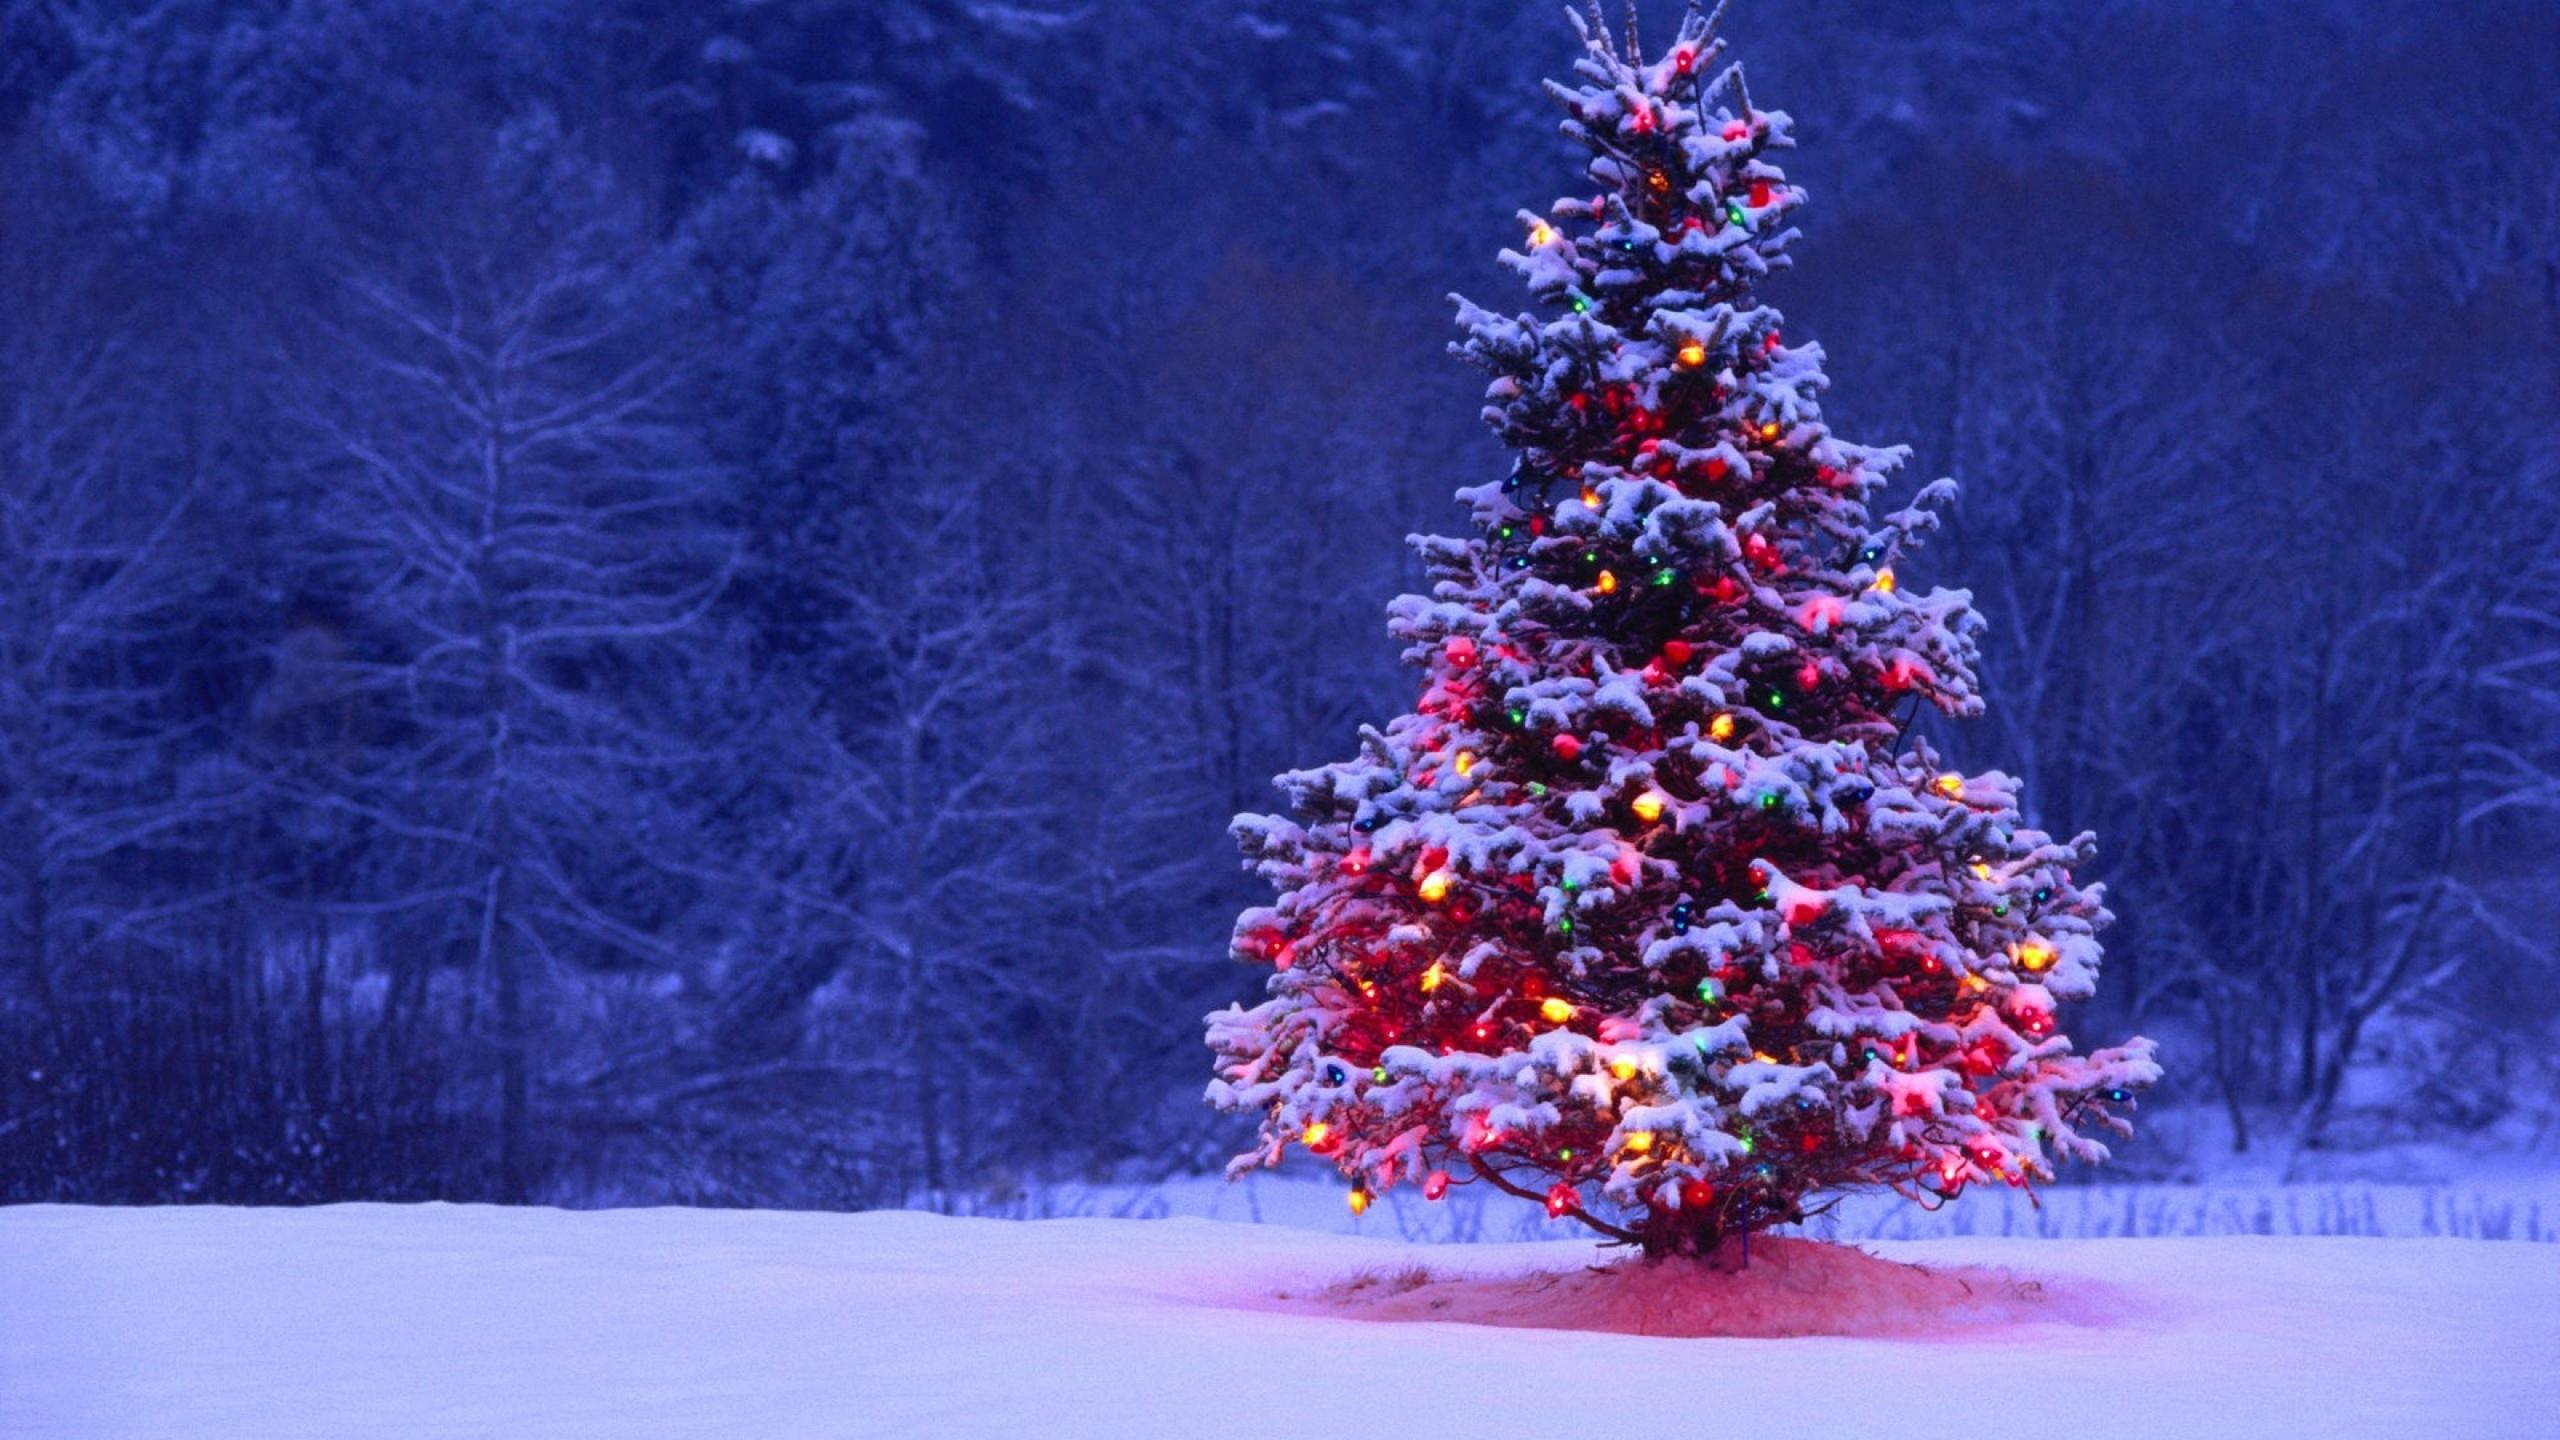 christmas tree lights snow forest holiday desktop wallpaper